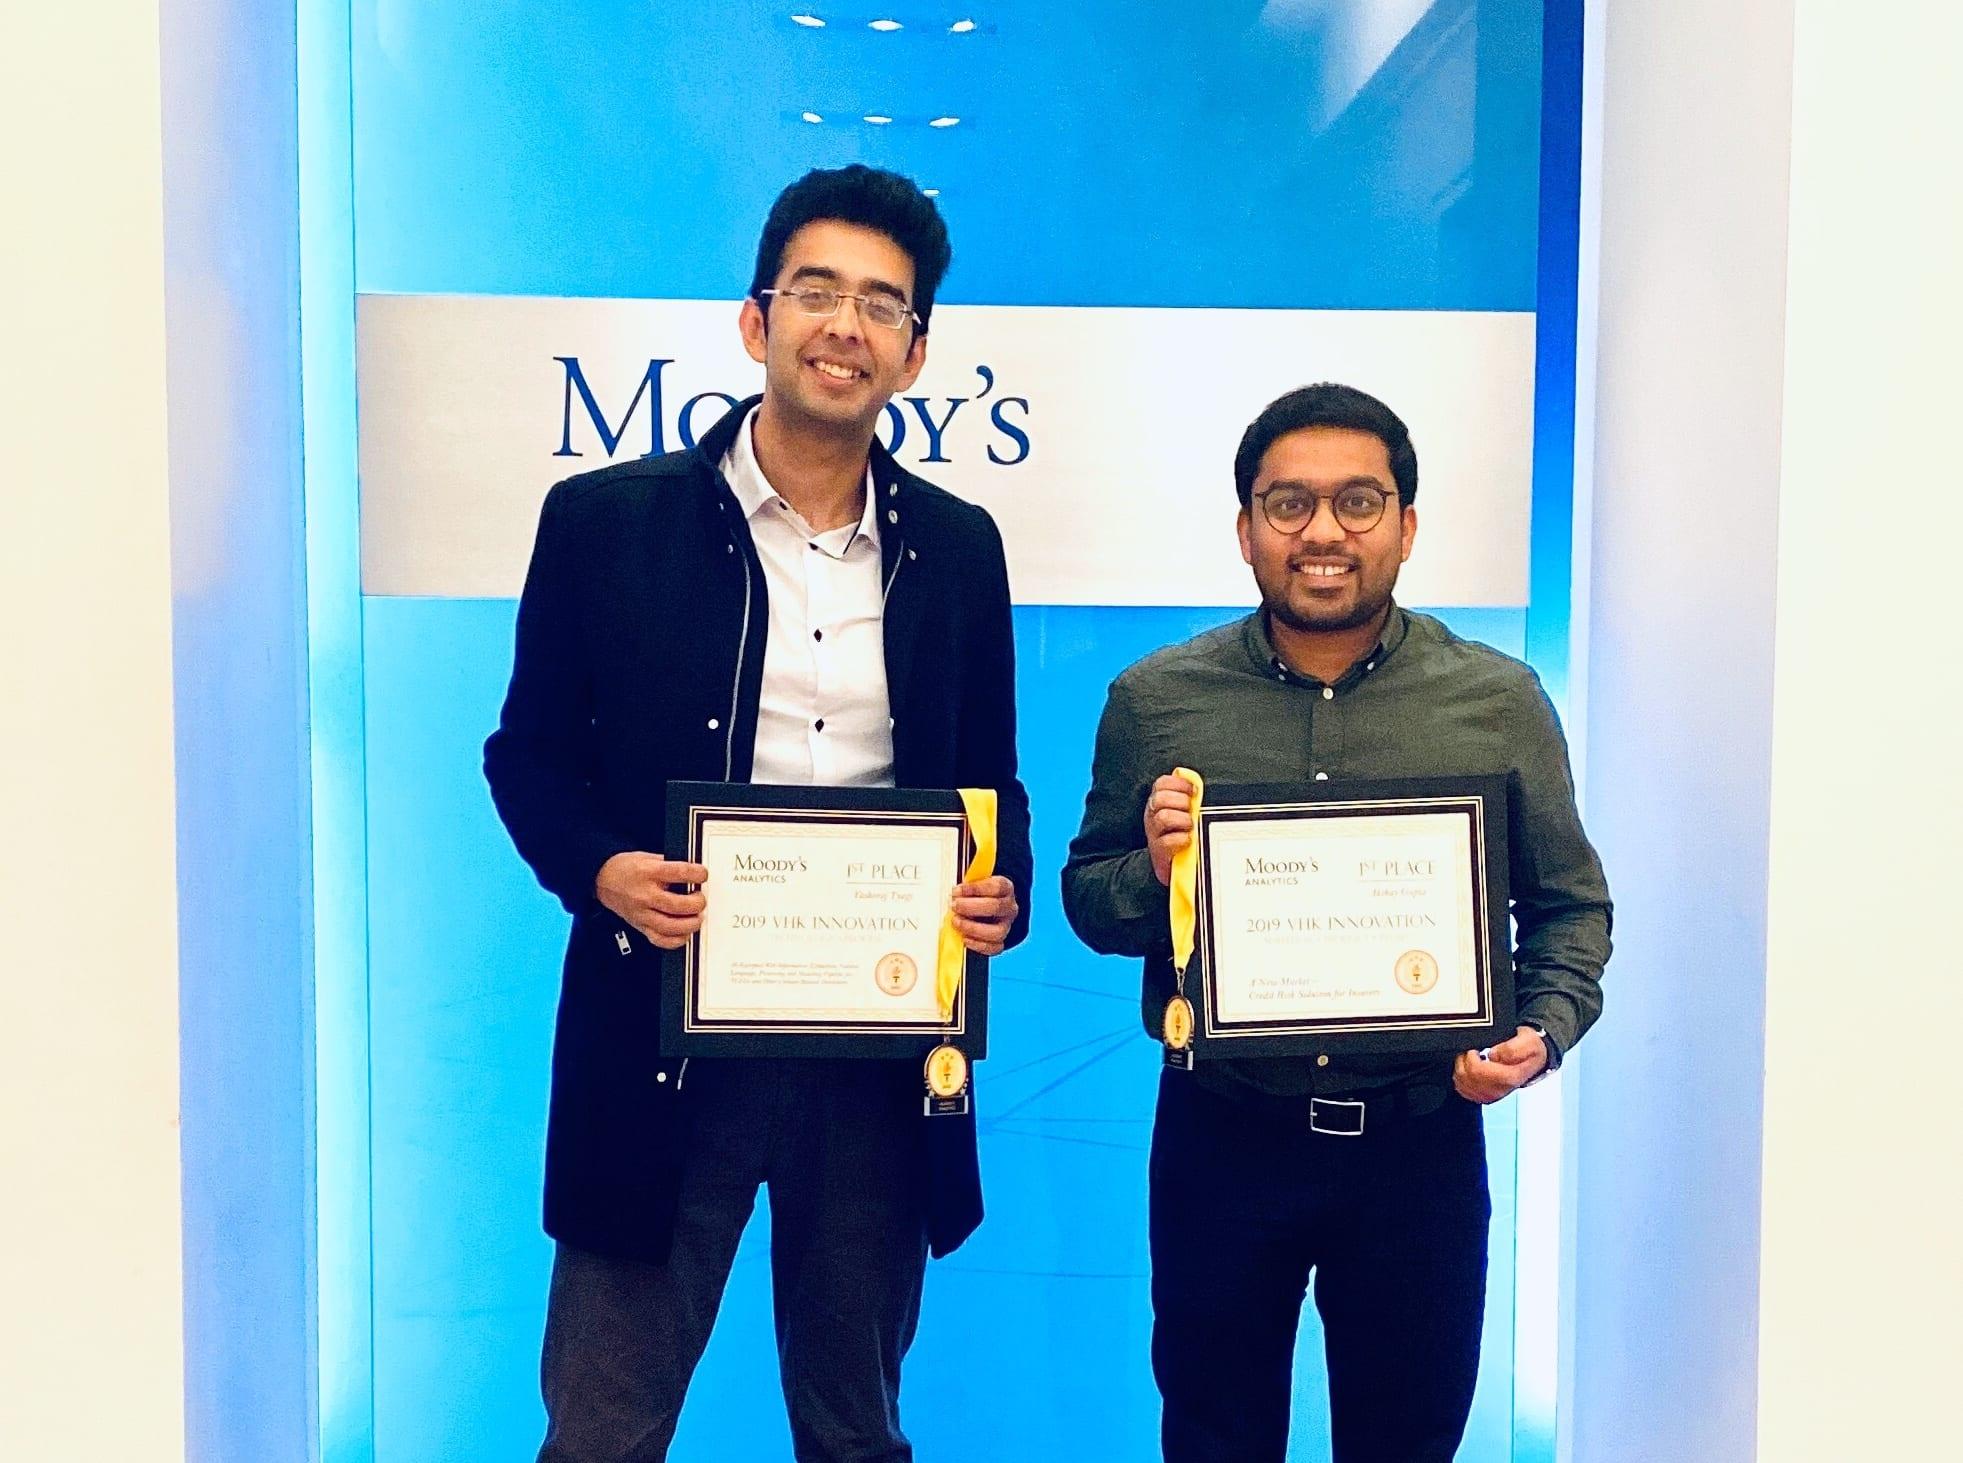 Two Berkeley MFE students holding awards